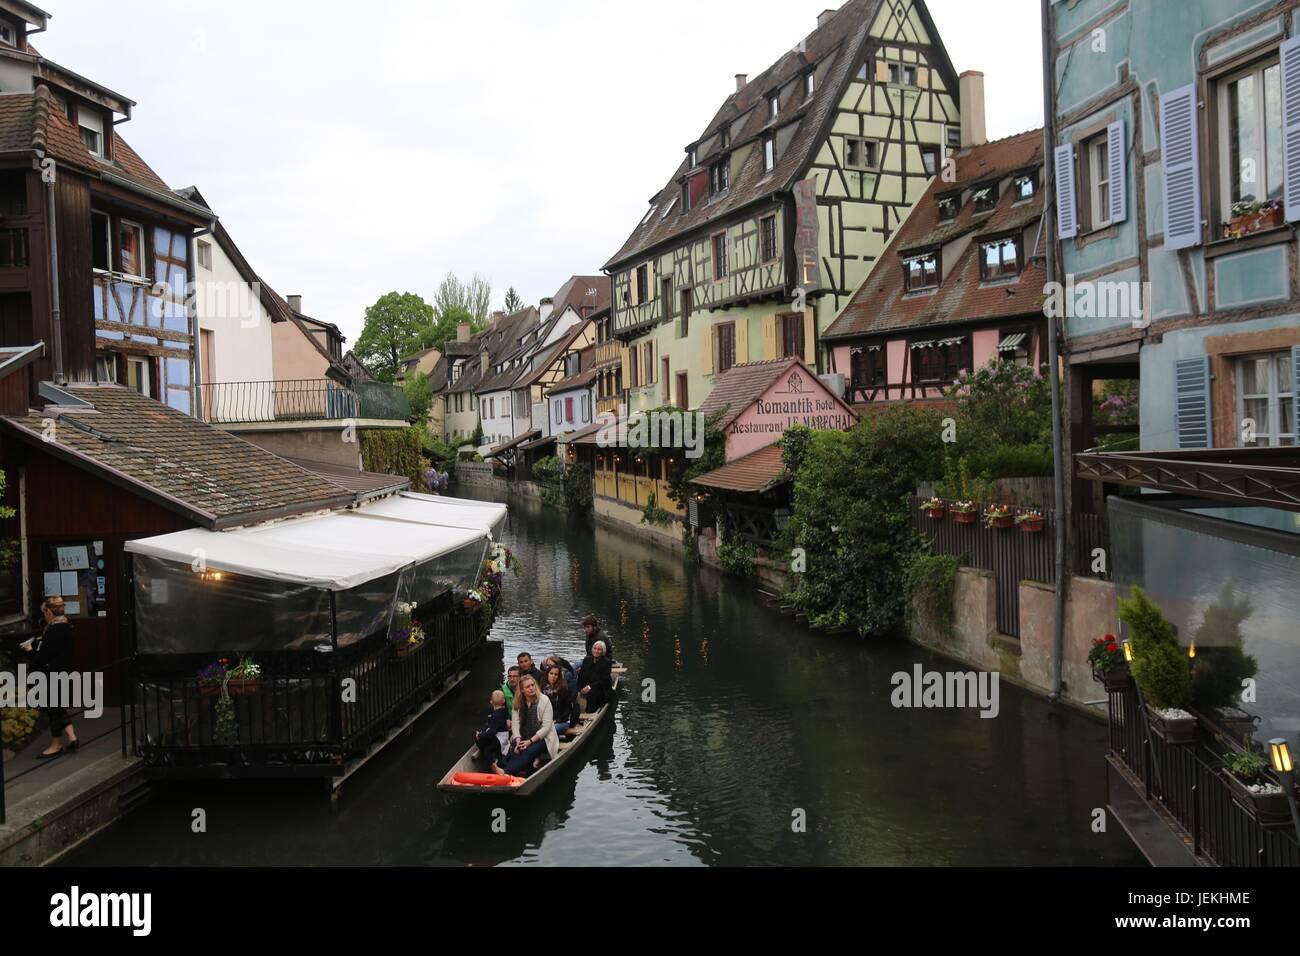 Colmar, France, Malcolm Buckland - Stock Image